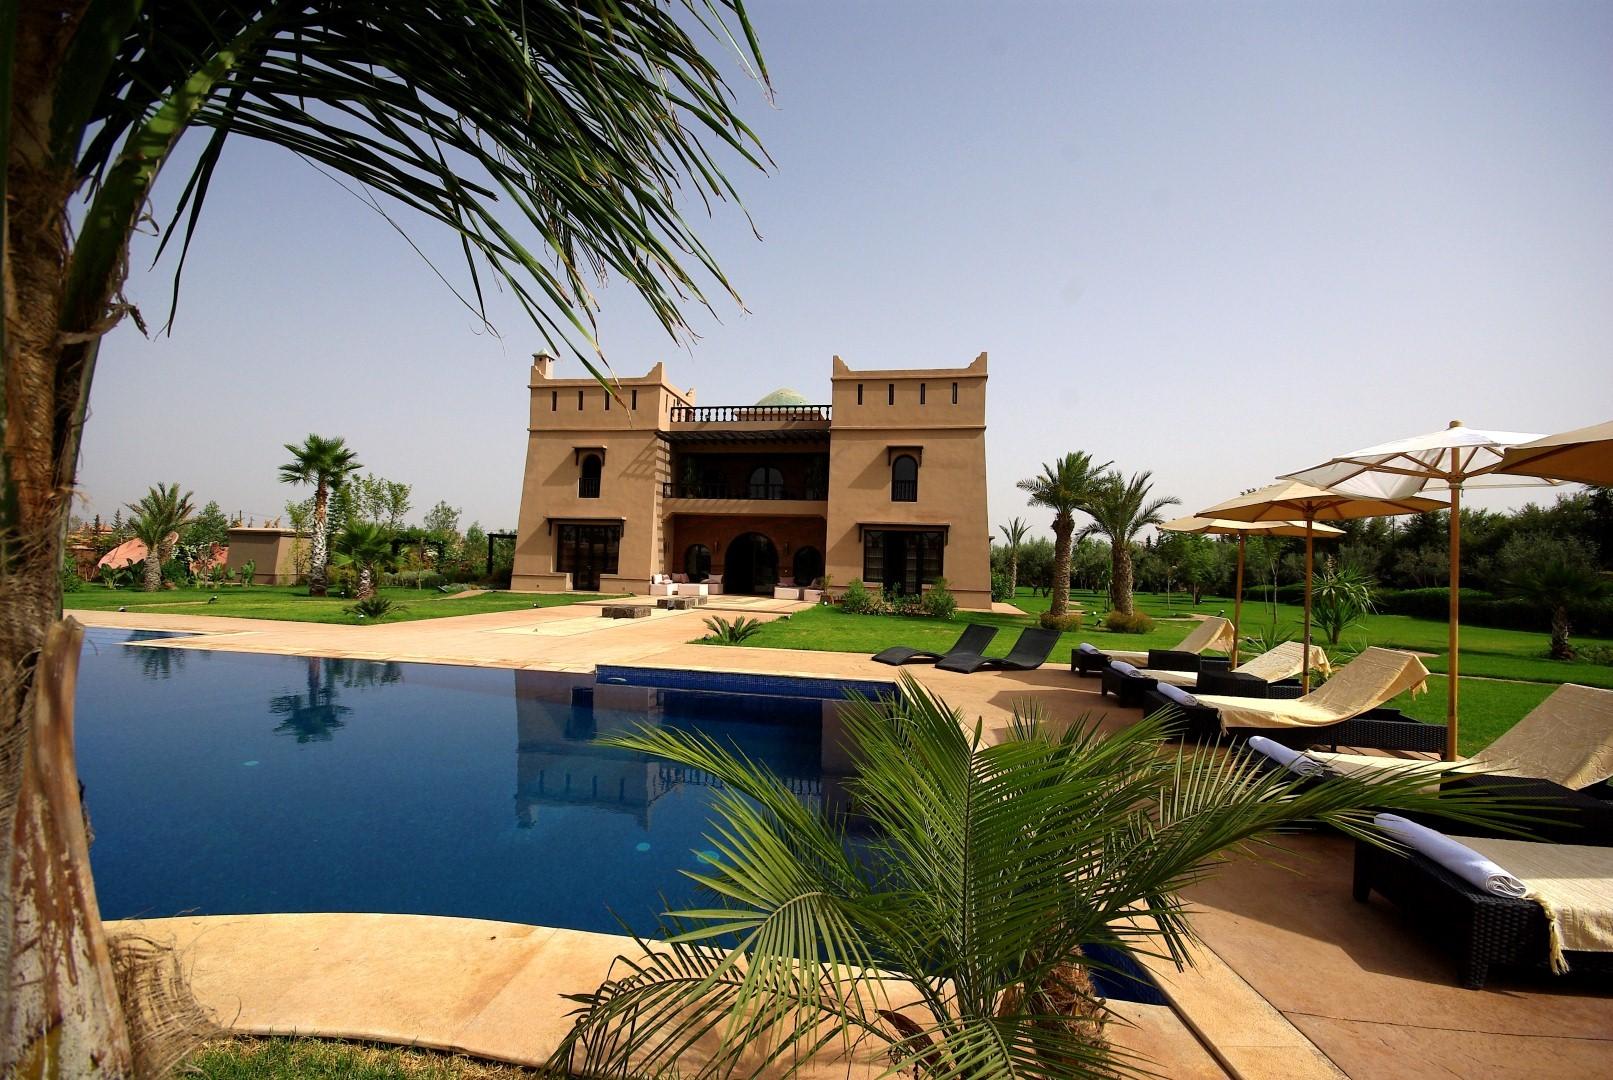 villa r ve d 39 orient superbe villa louer marrakech. Black Bedroom Furniture Sets. Home Design Ideas